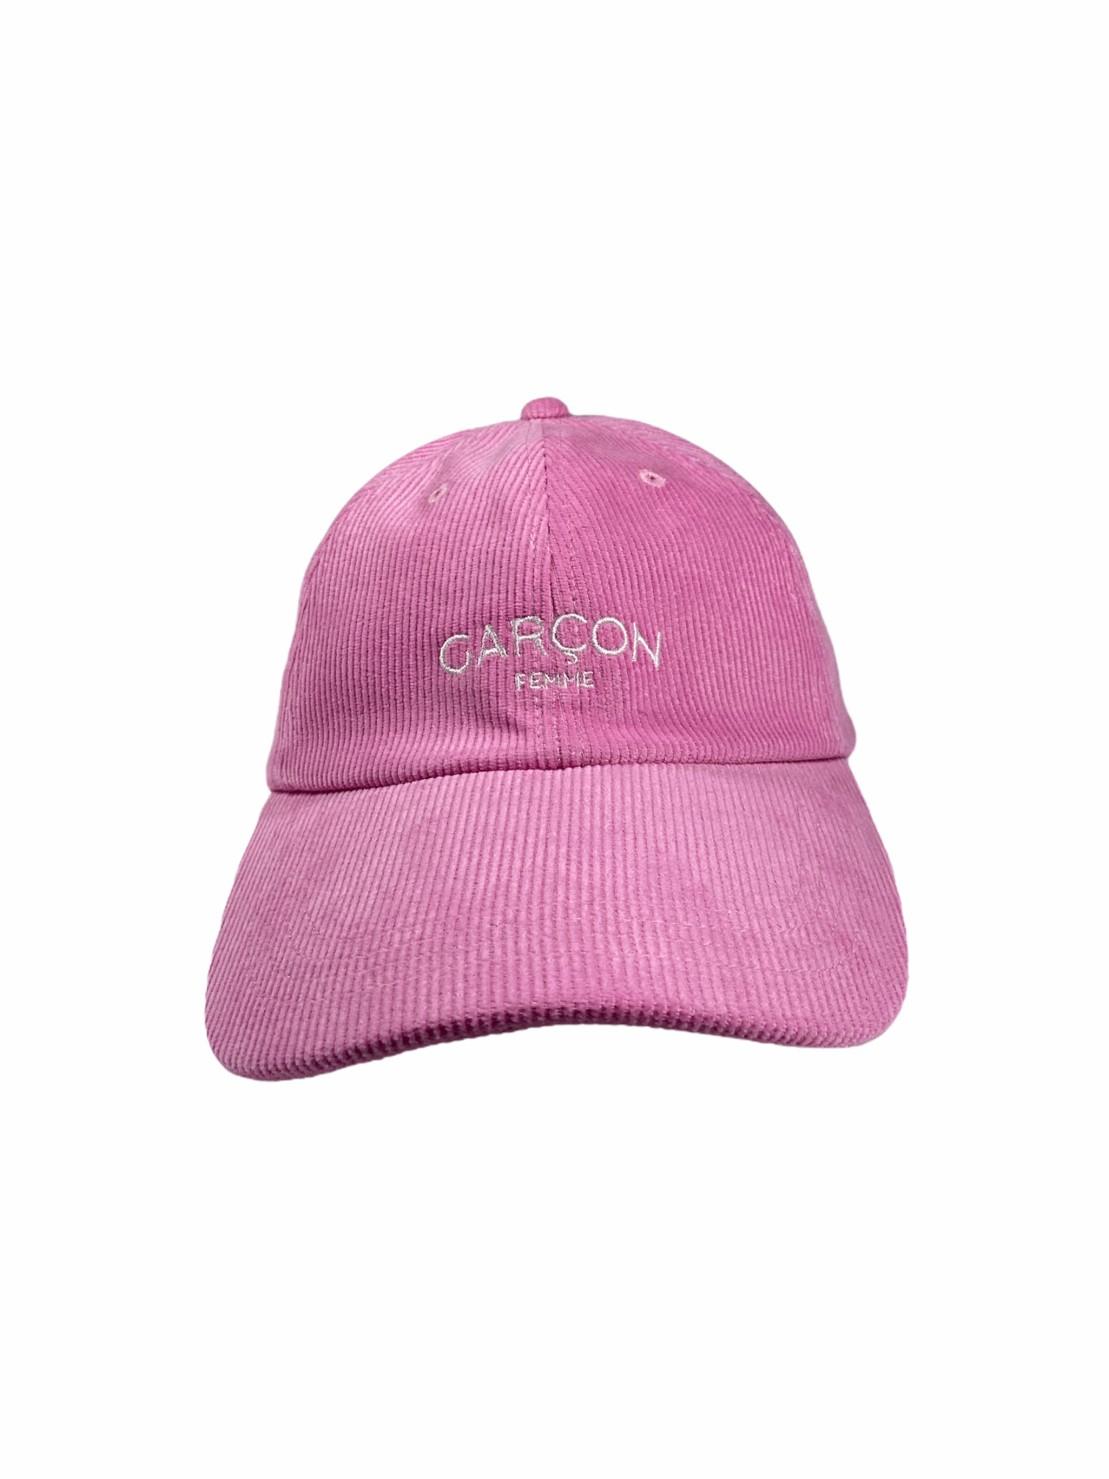 Garcon Cap - Femme (Flamingo Pink)